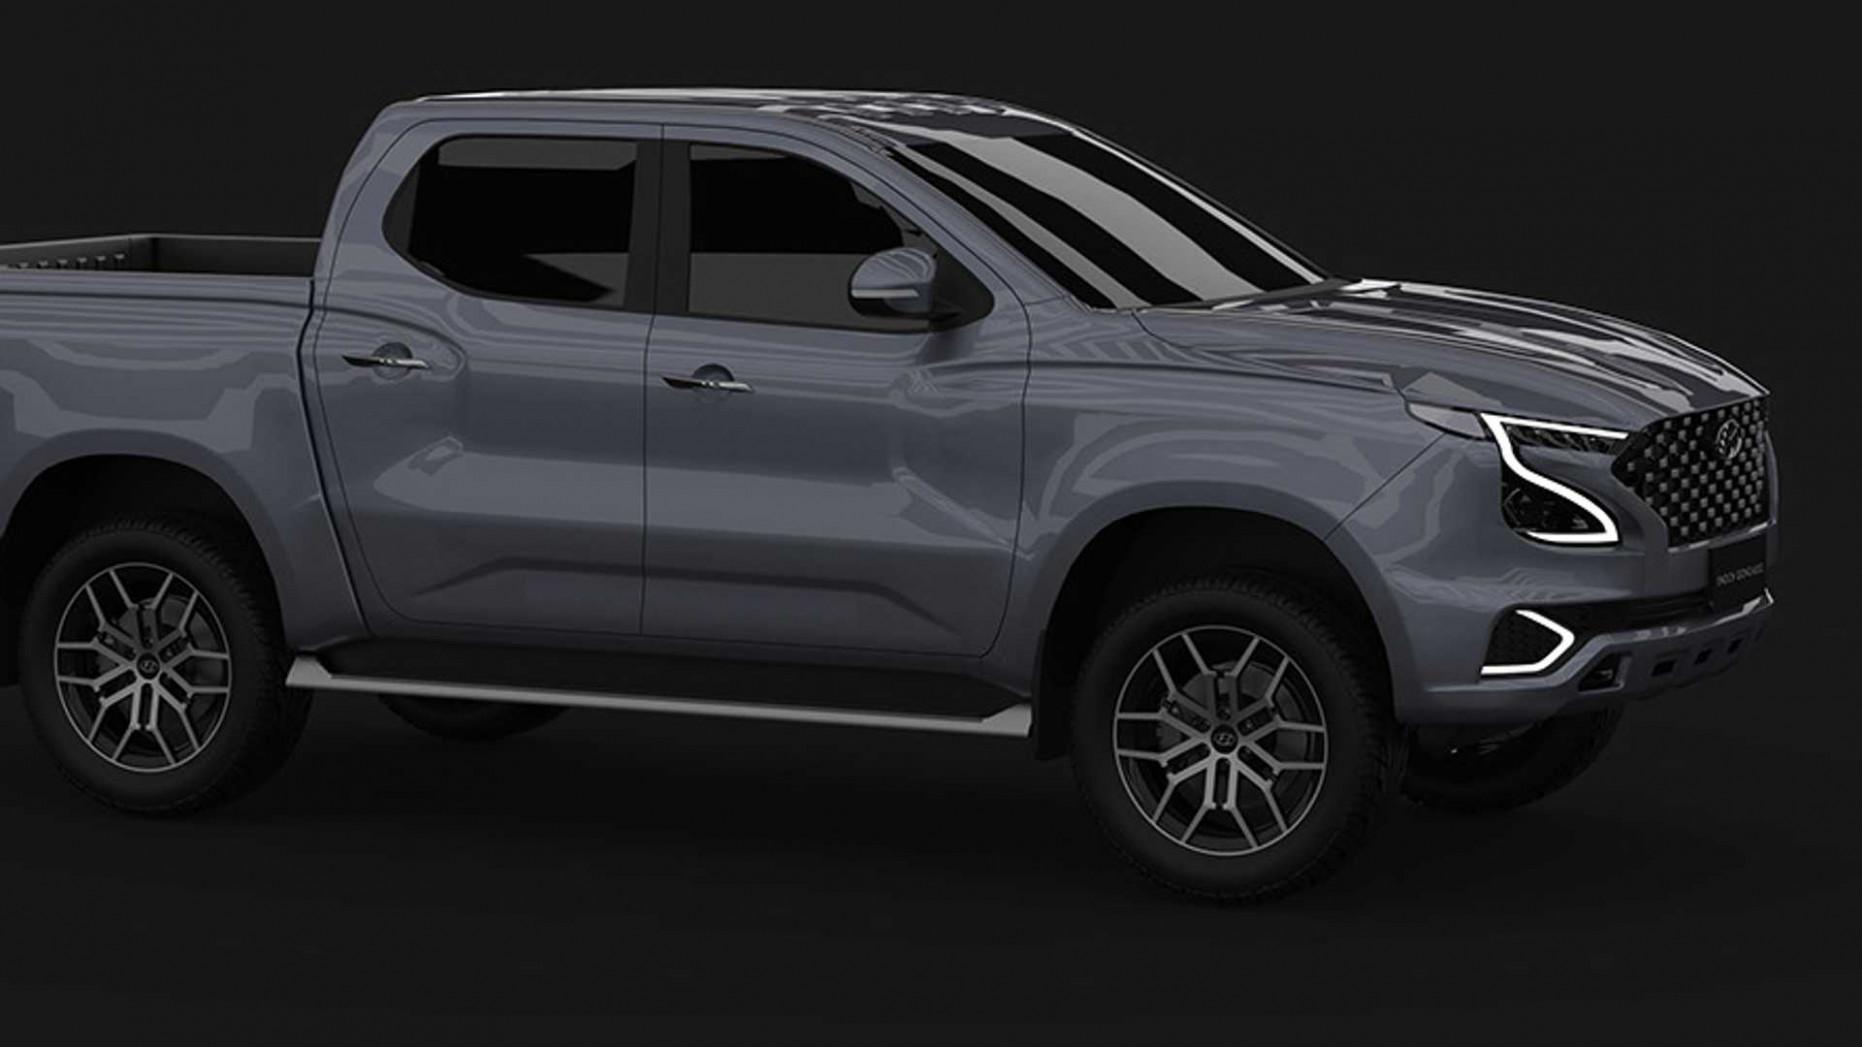 Performance Hyundai Palisade 2022 Price Philippines